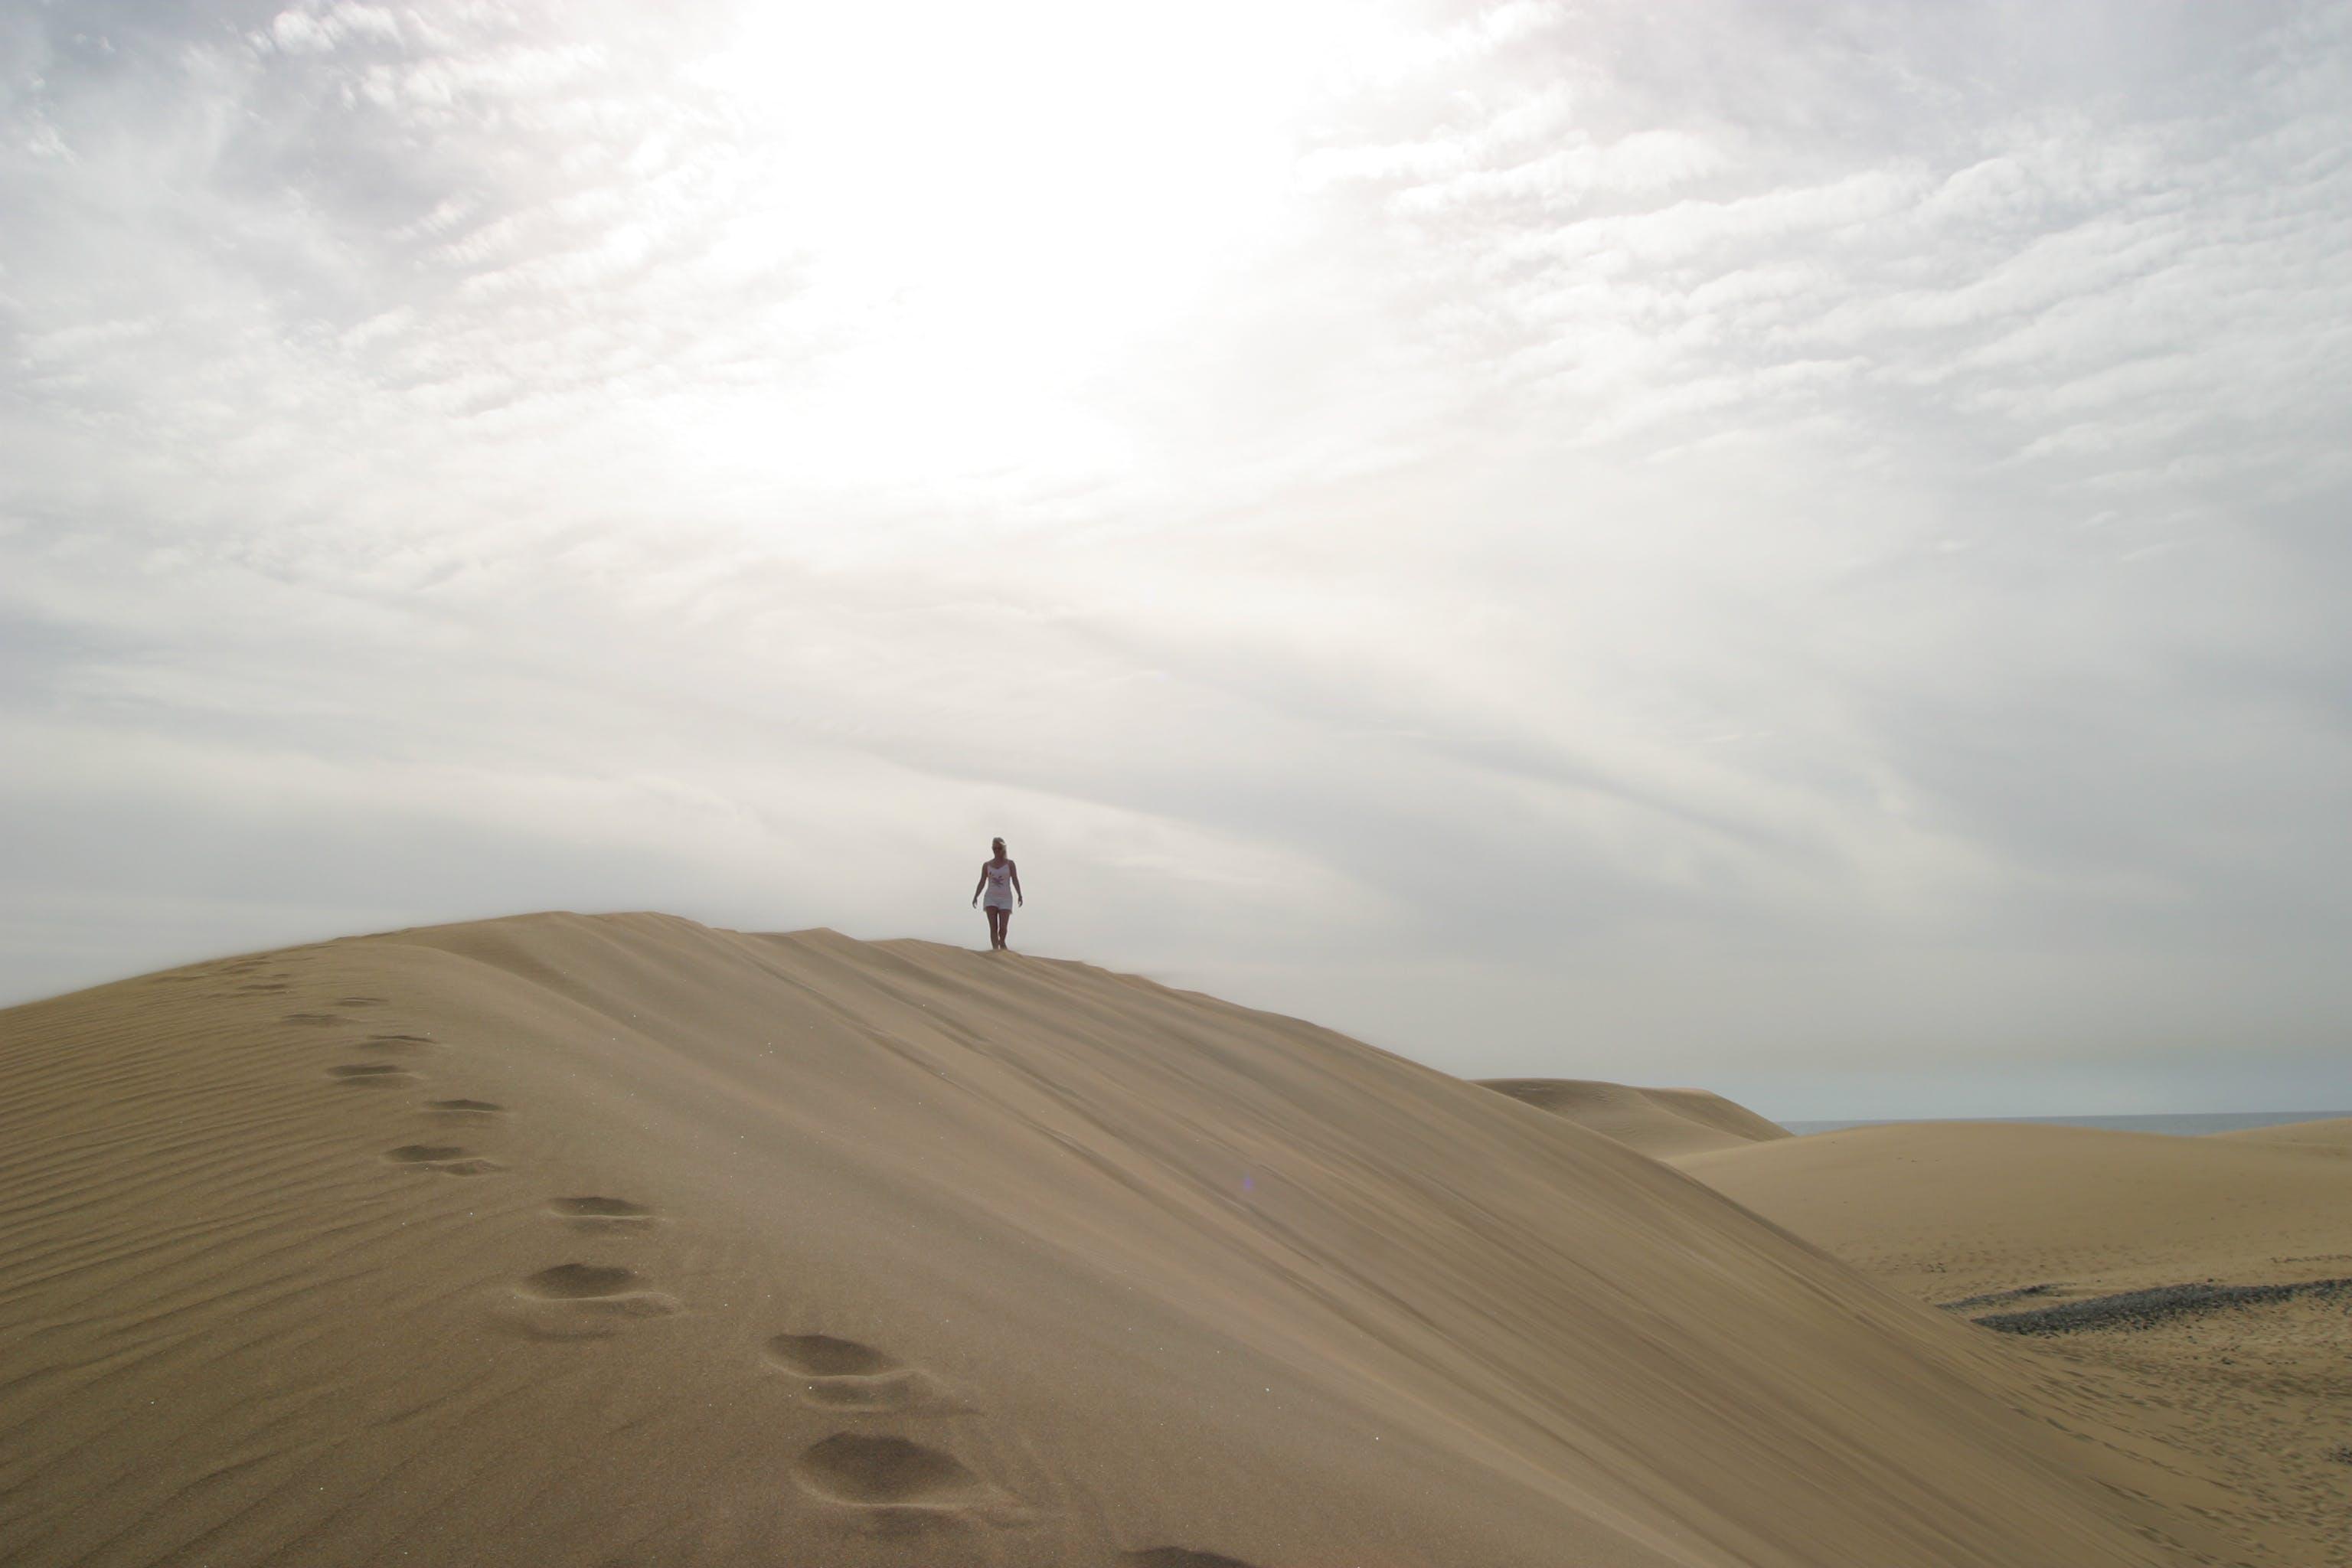 Person Talking on Desert